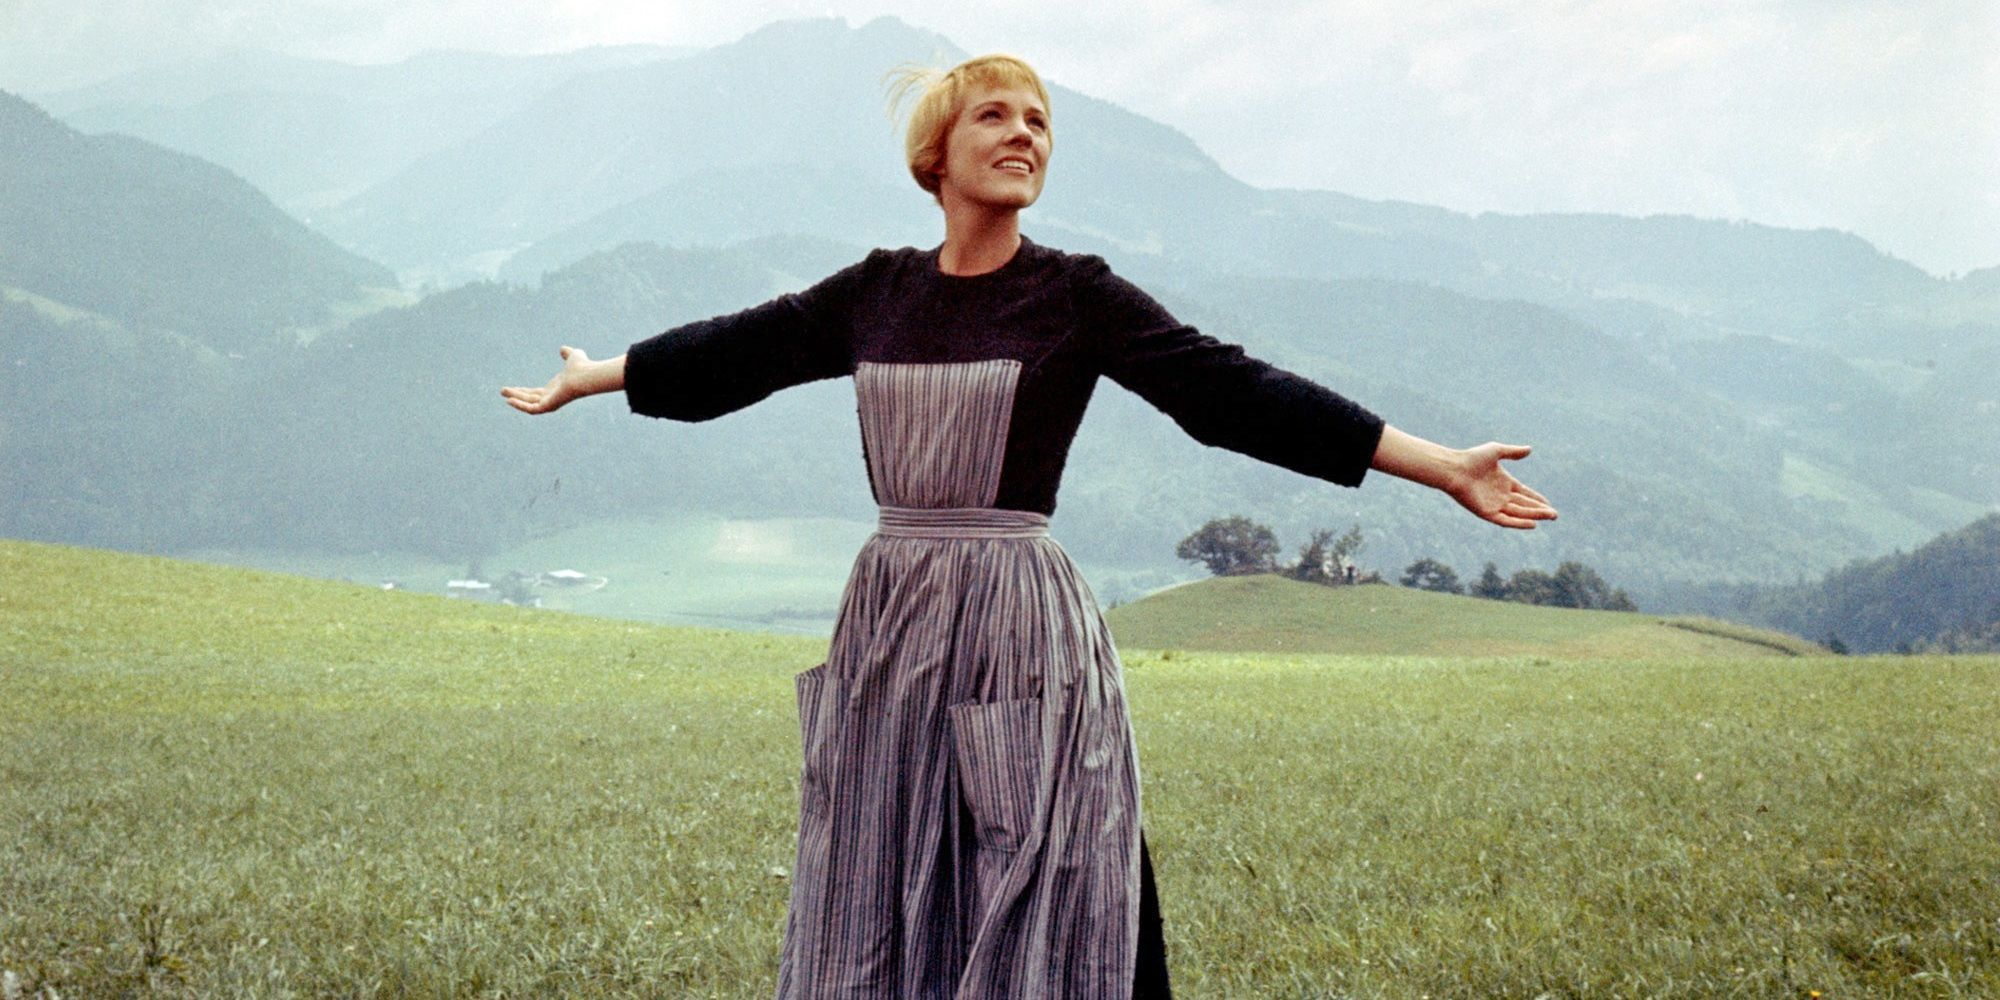 Julie Andrews On Filming Sound Of Music Julie Andrews Filmed Sound Of Music Hilltop Scene In The Rain